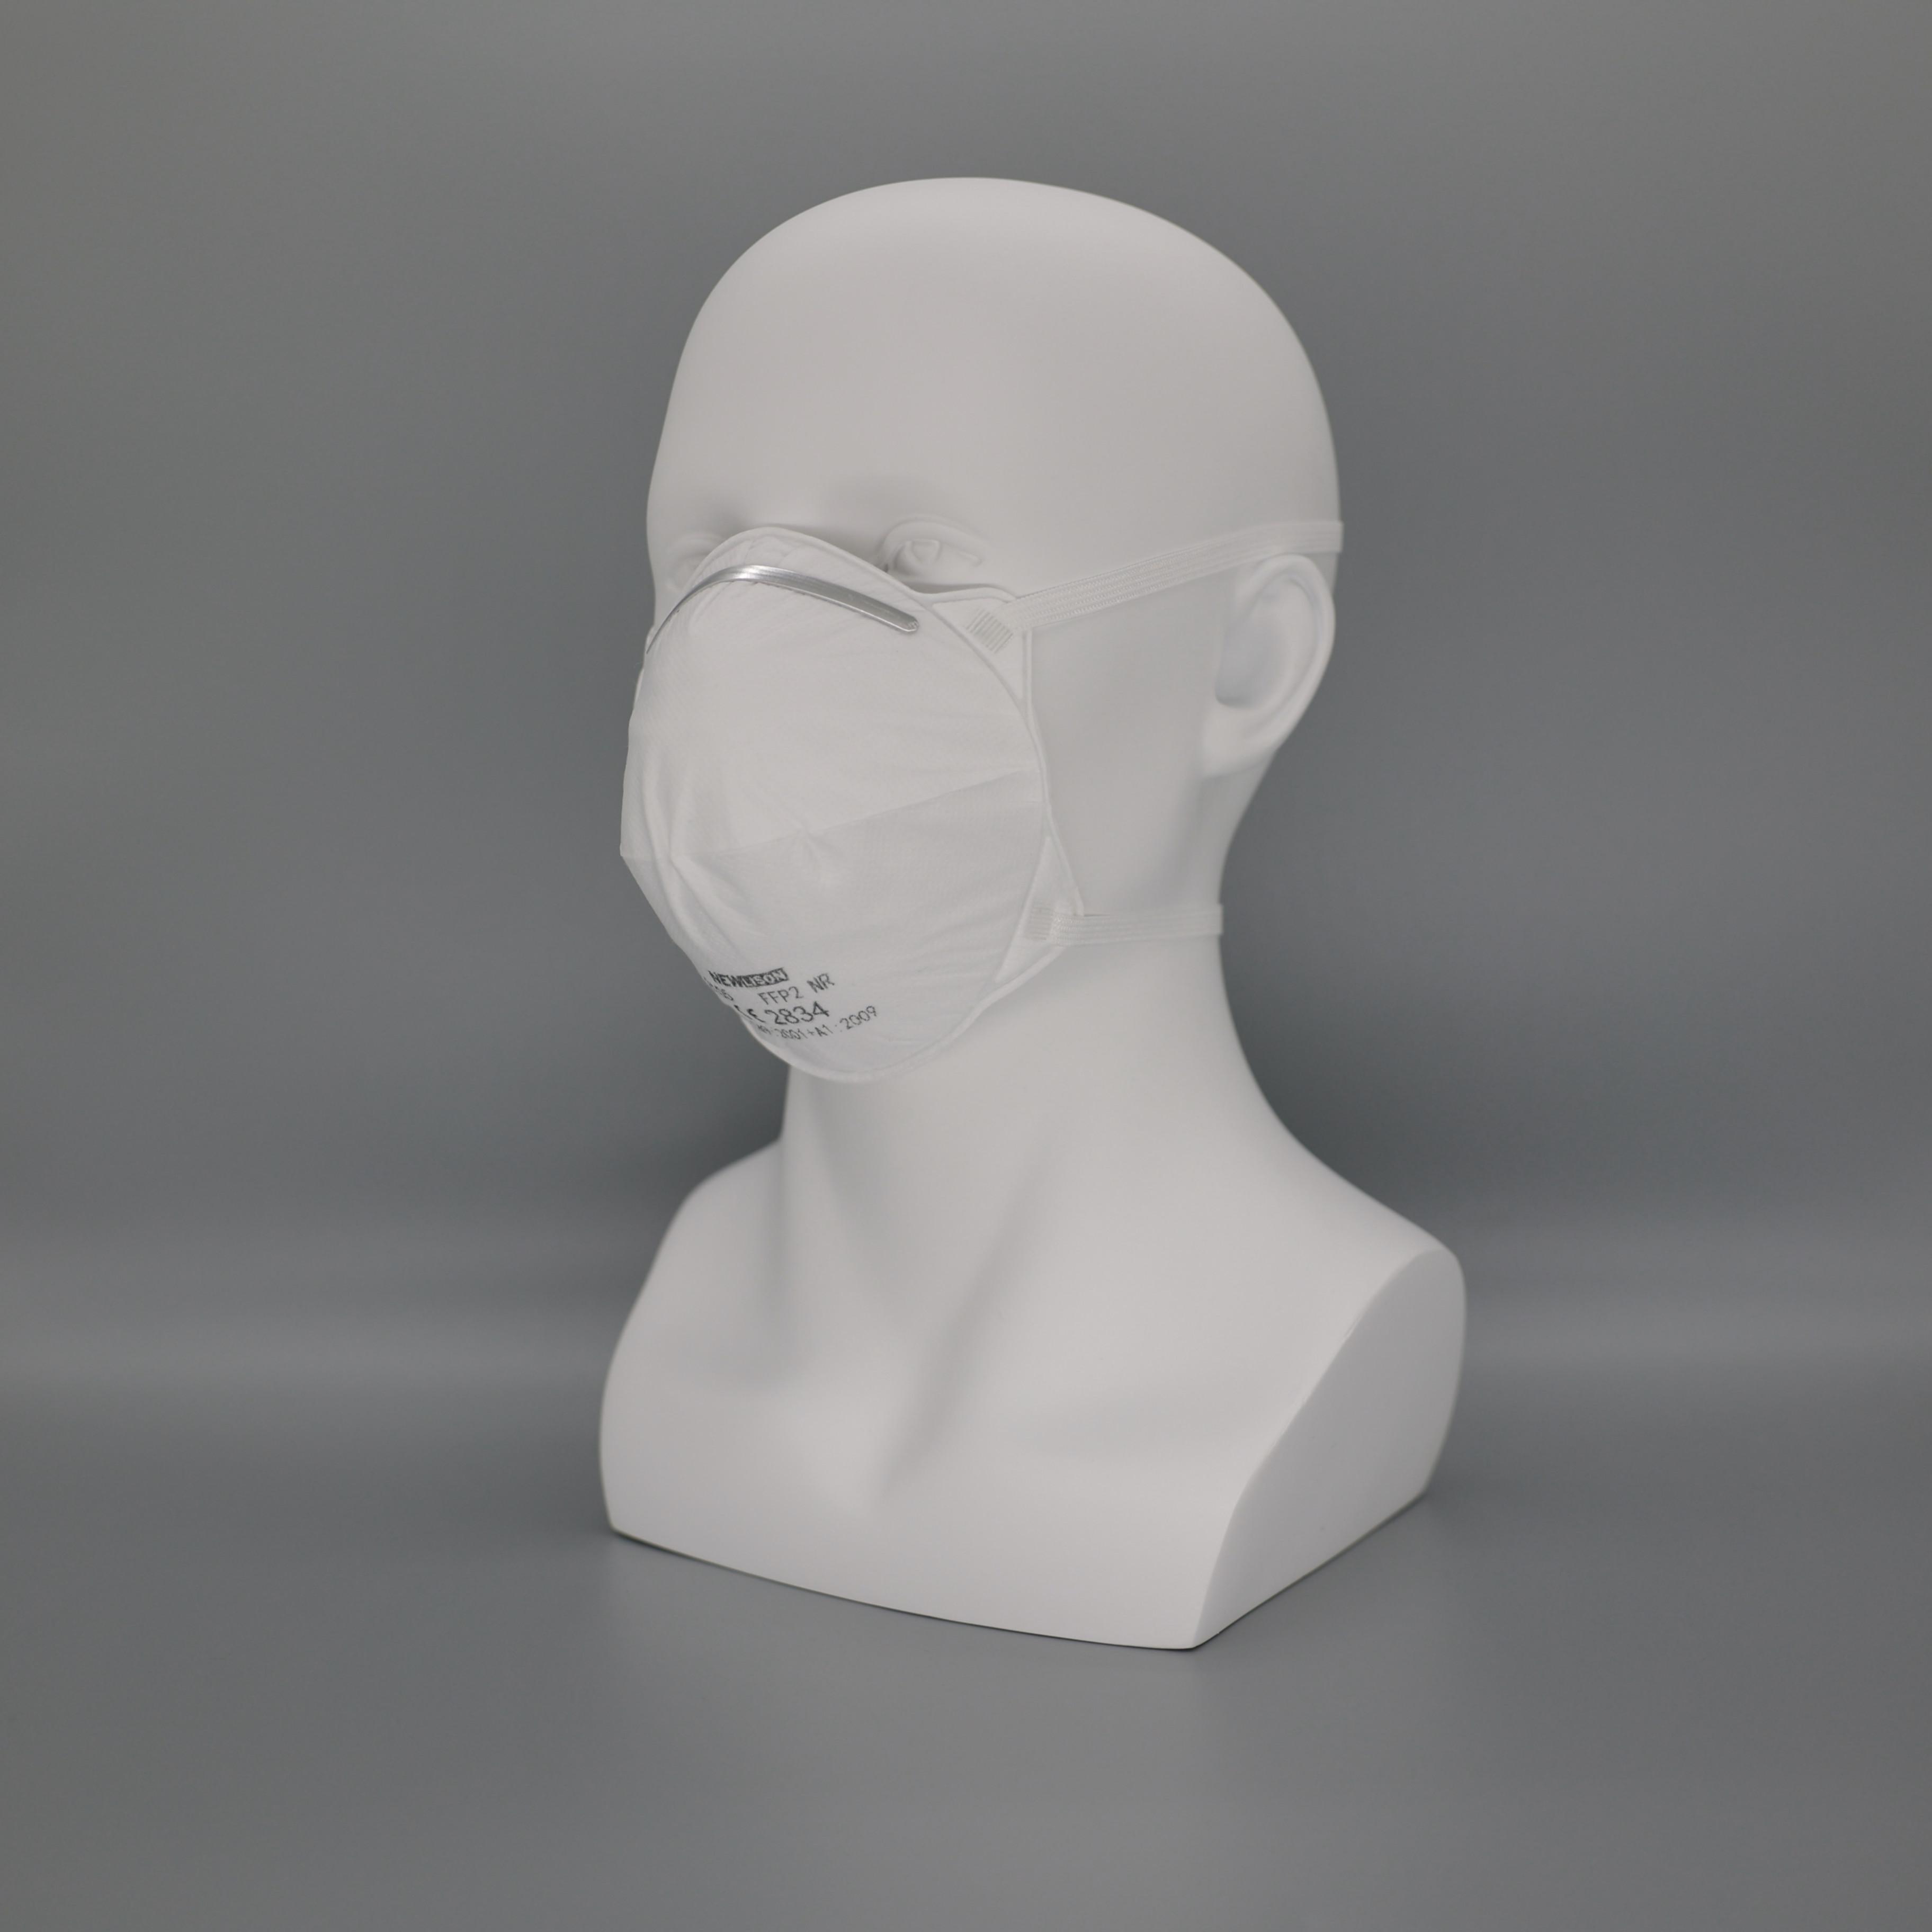 2105 FFP2 NR CE Certificated EN149 Copper 3D Cup Style Newlison PPE White List Mascarilla Facial COIVDE 19 Custom Face Mask - KingCare | KingCare.net